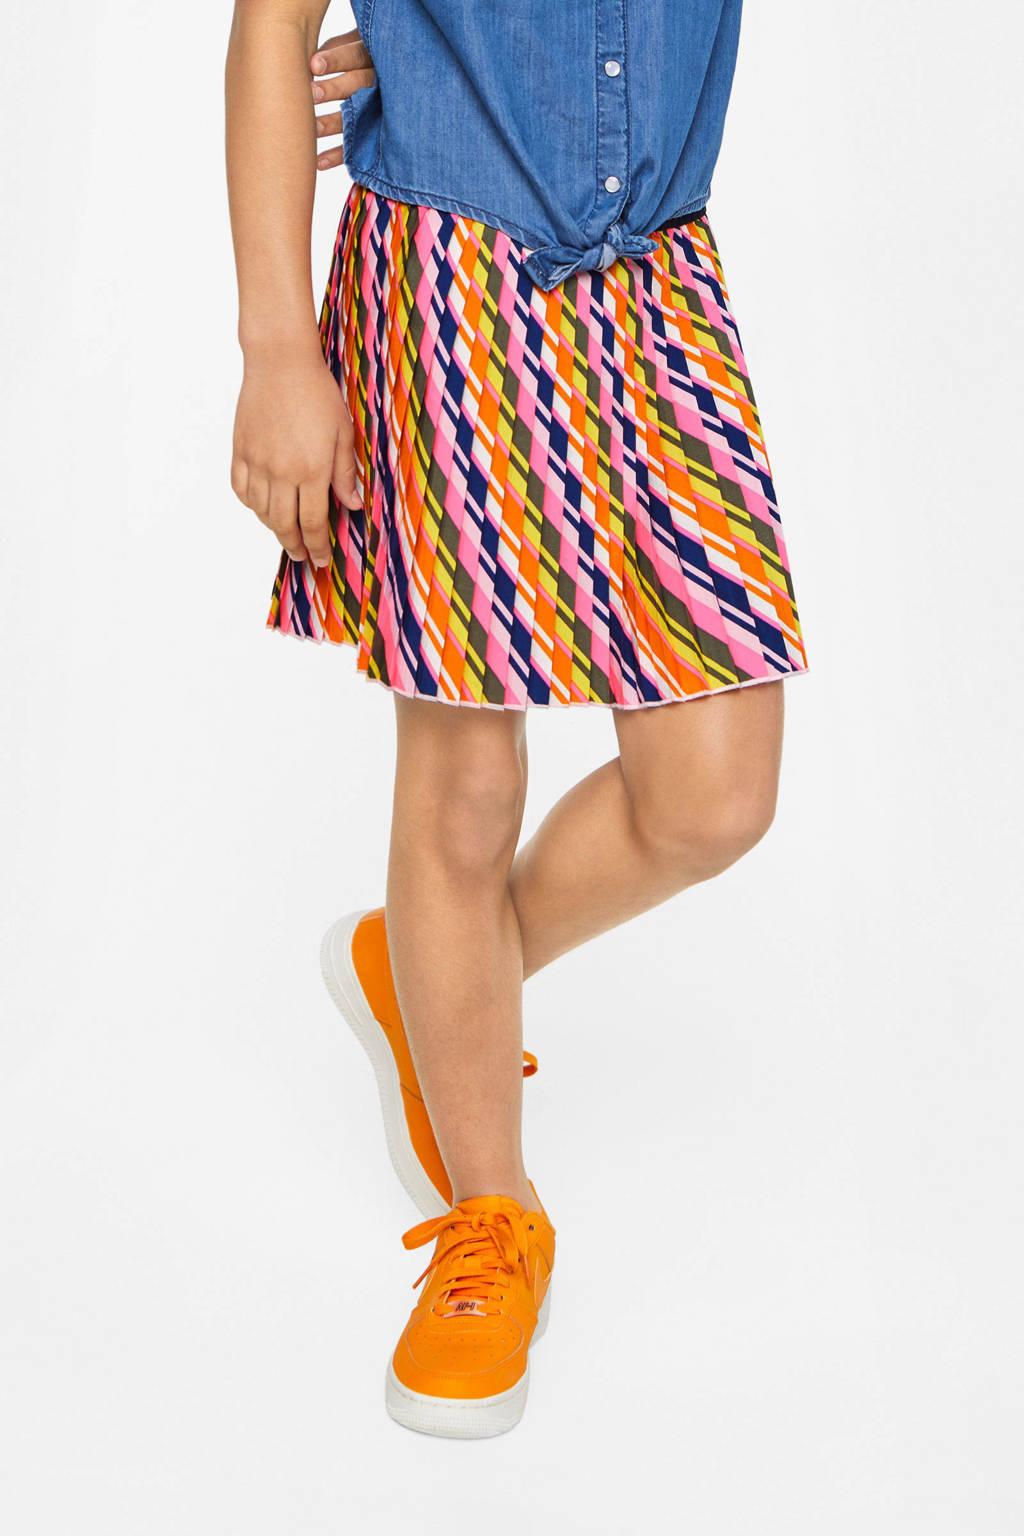 WE Fashion rok met grafische print en glitters roze/donkerblauw/geel, Roze/donkerblauw/geel